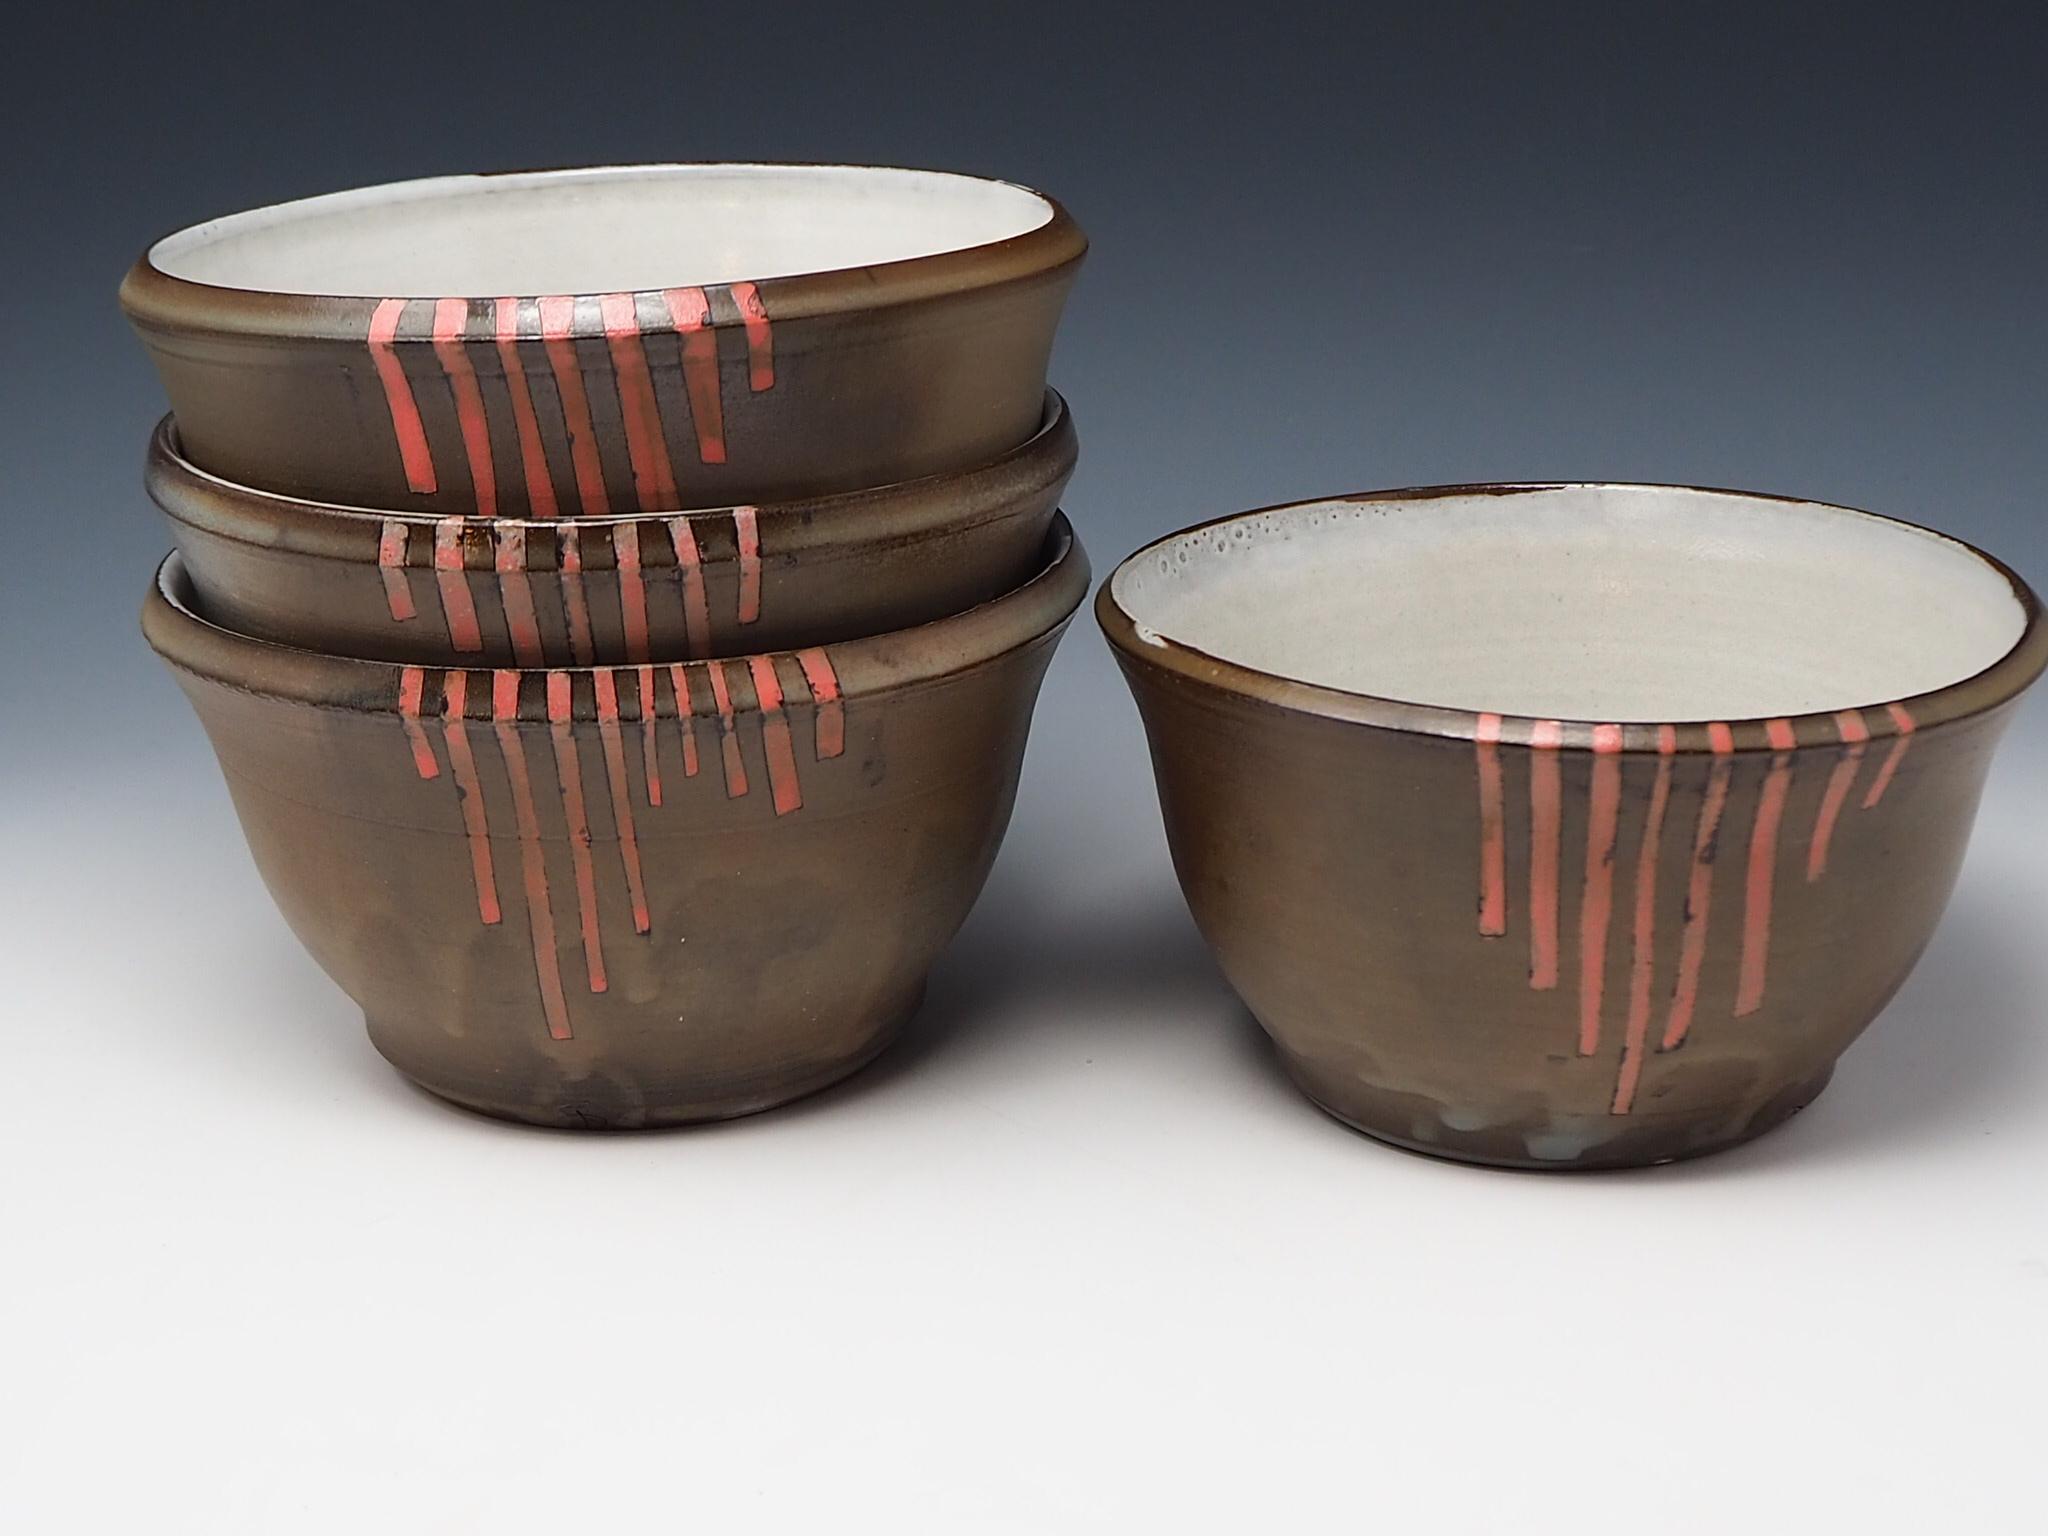 Drip Bowls